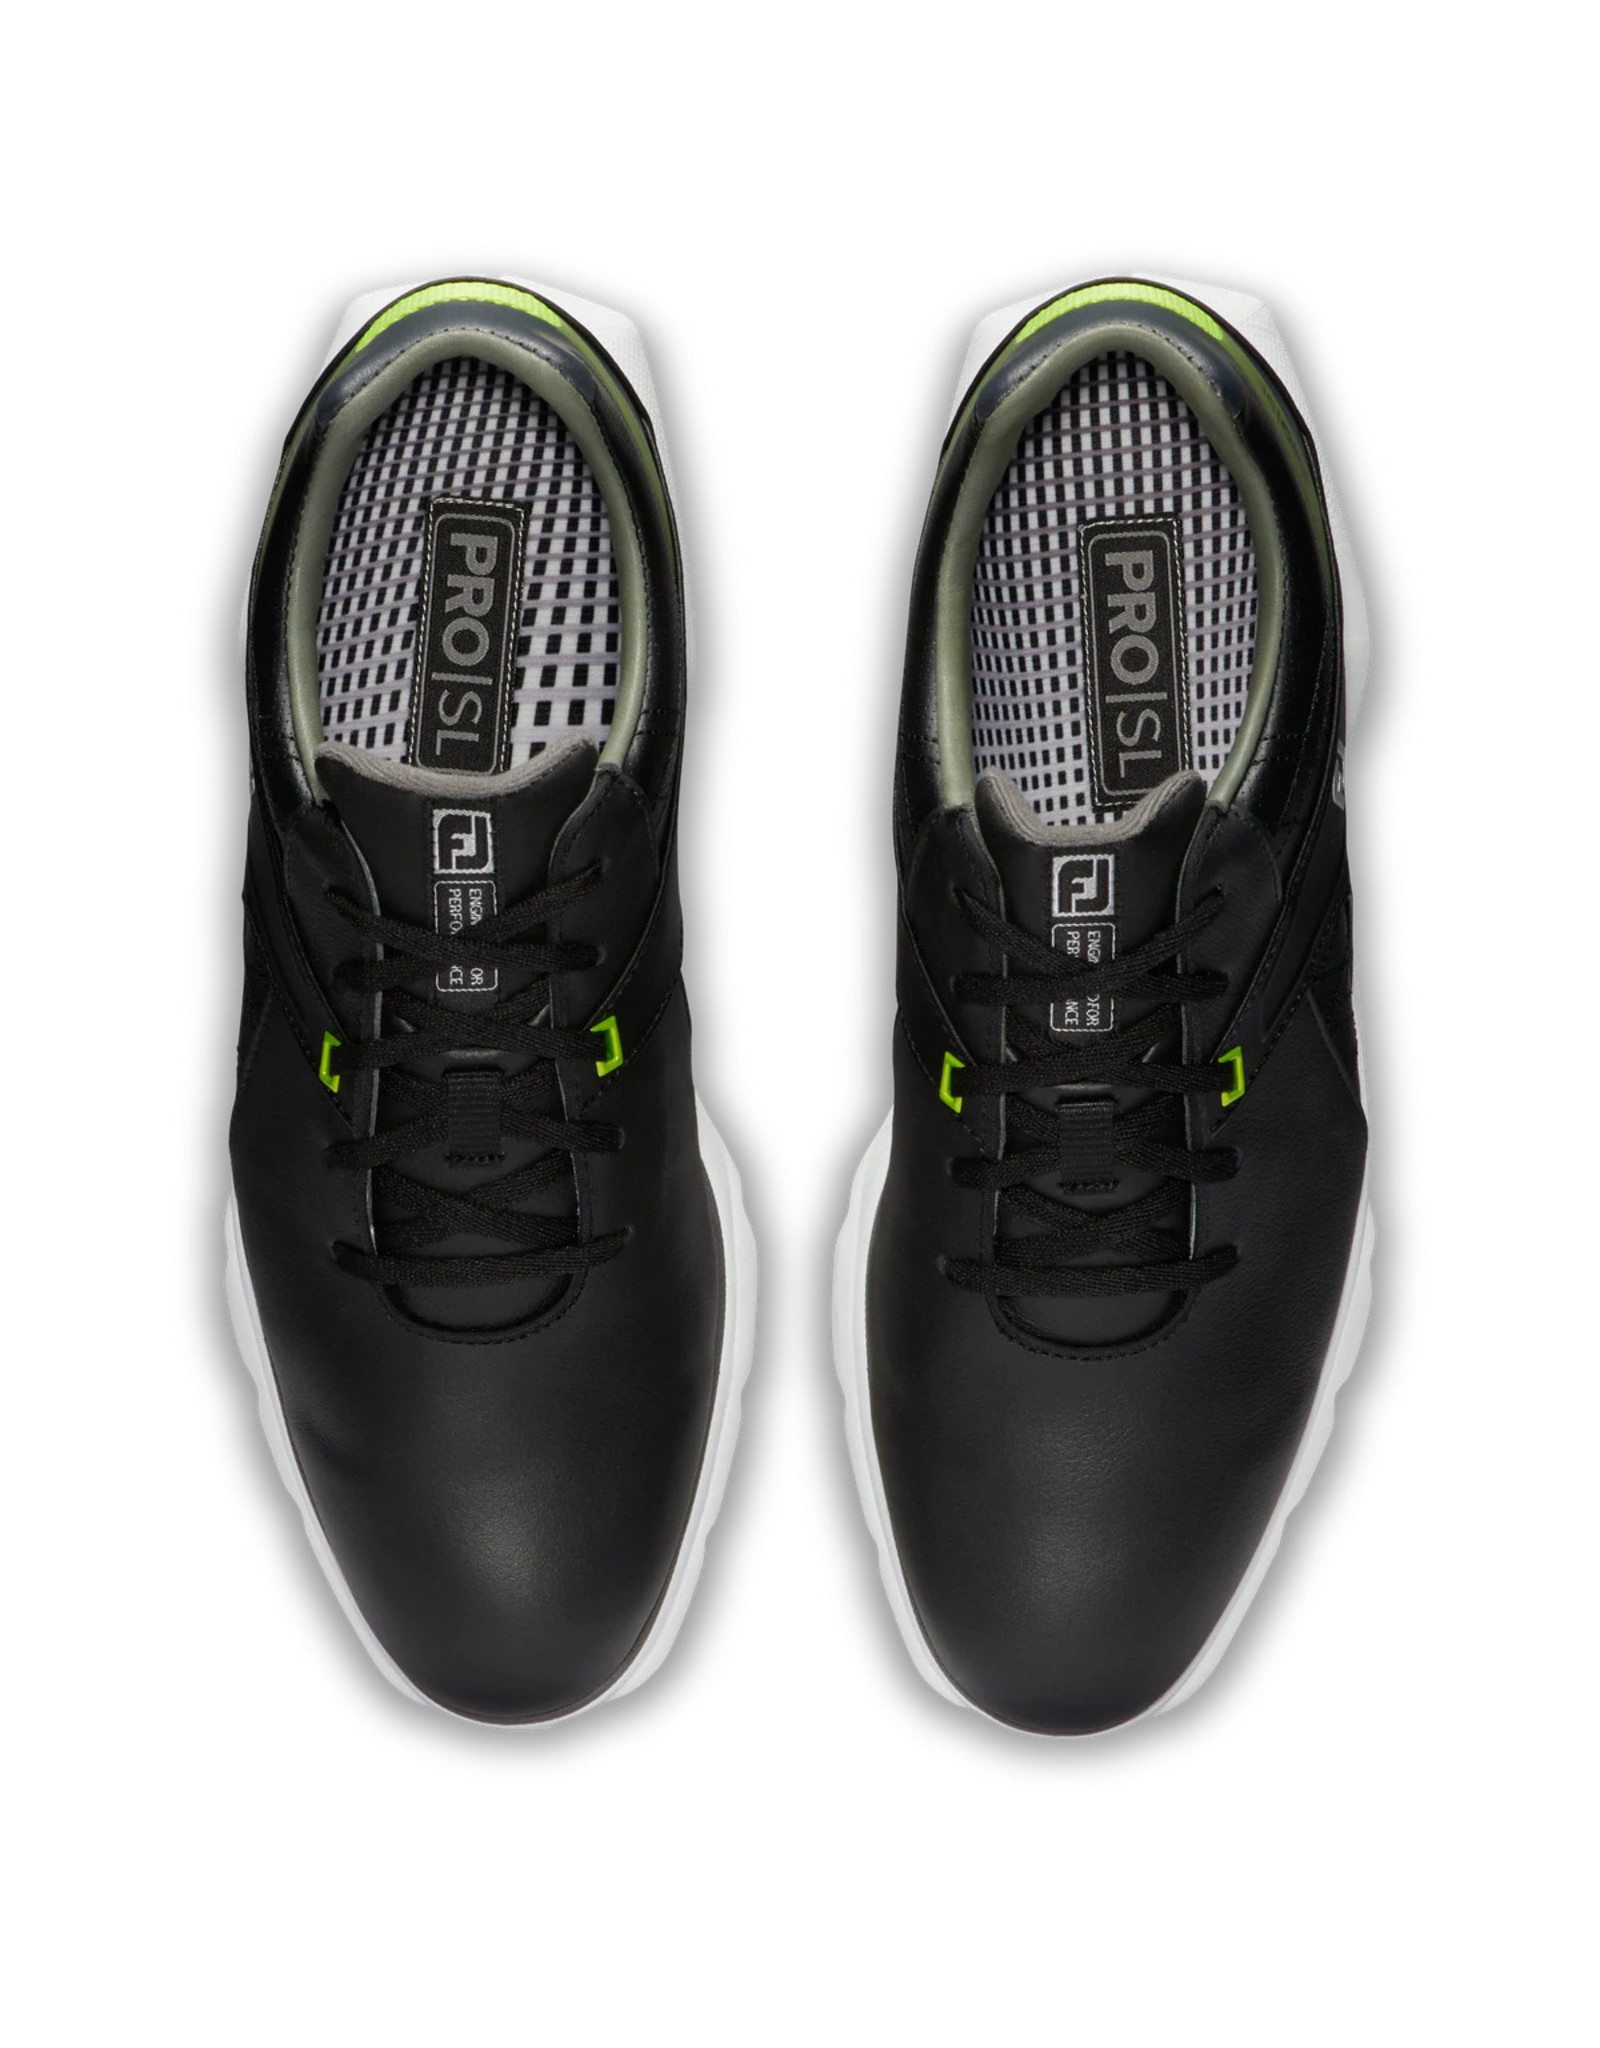 Footjoy FootJoy Pro SL Spikeless BLK/LIM TRIM